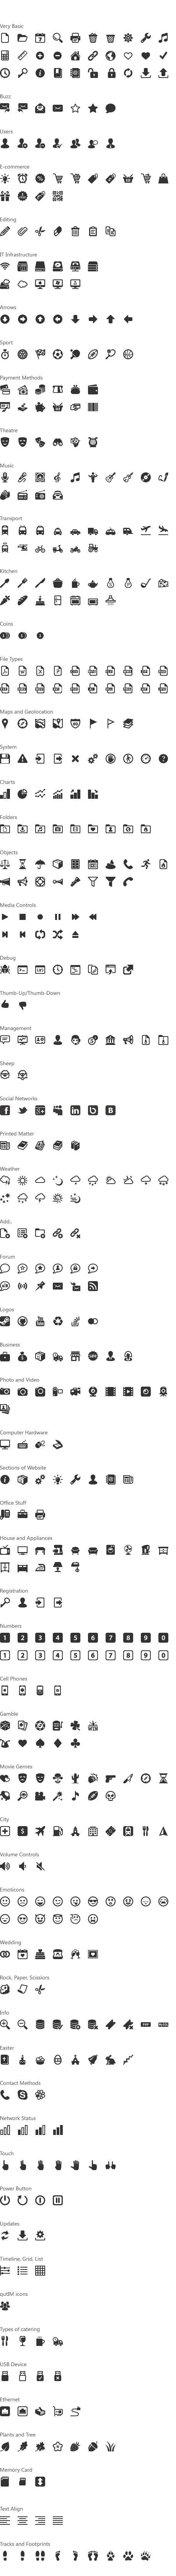 Free Download : 529 Icon Windows 8 Metro Style Pack